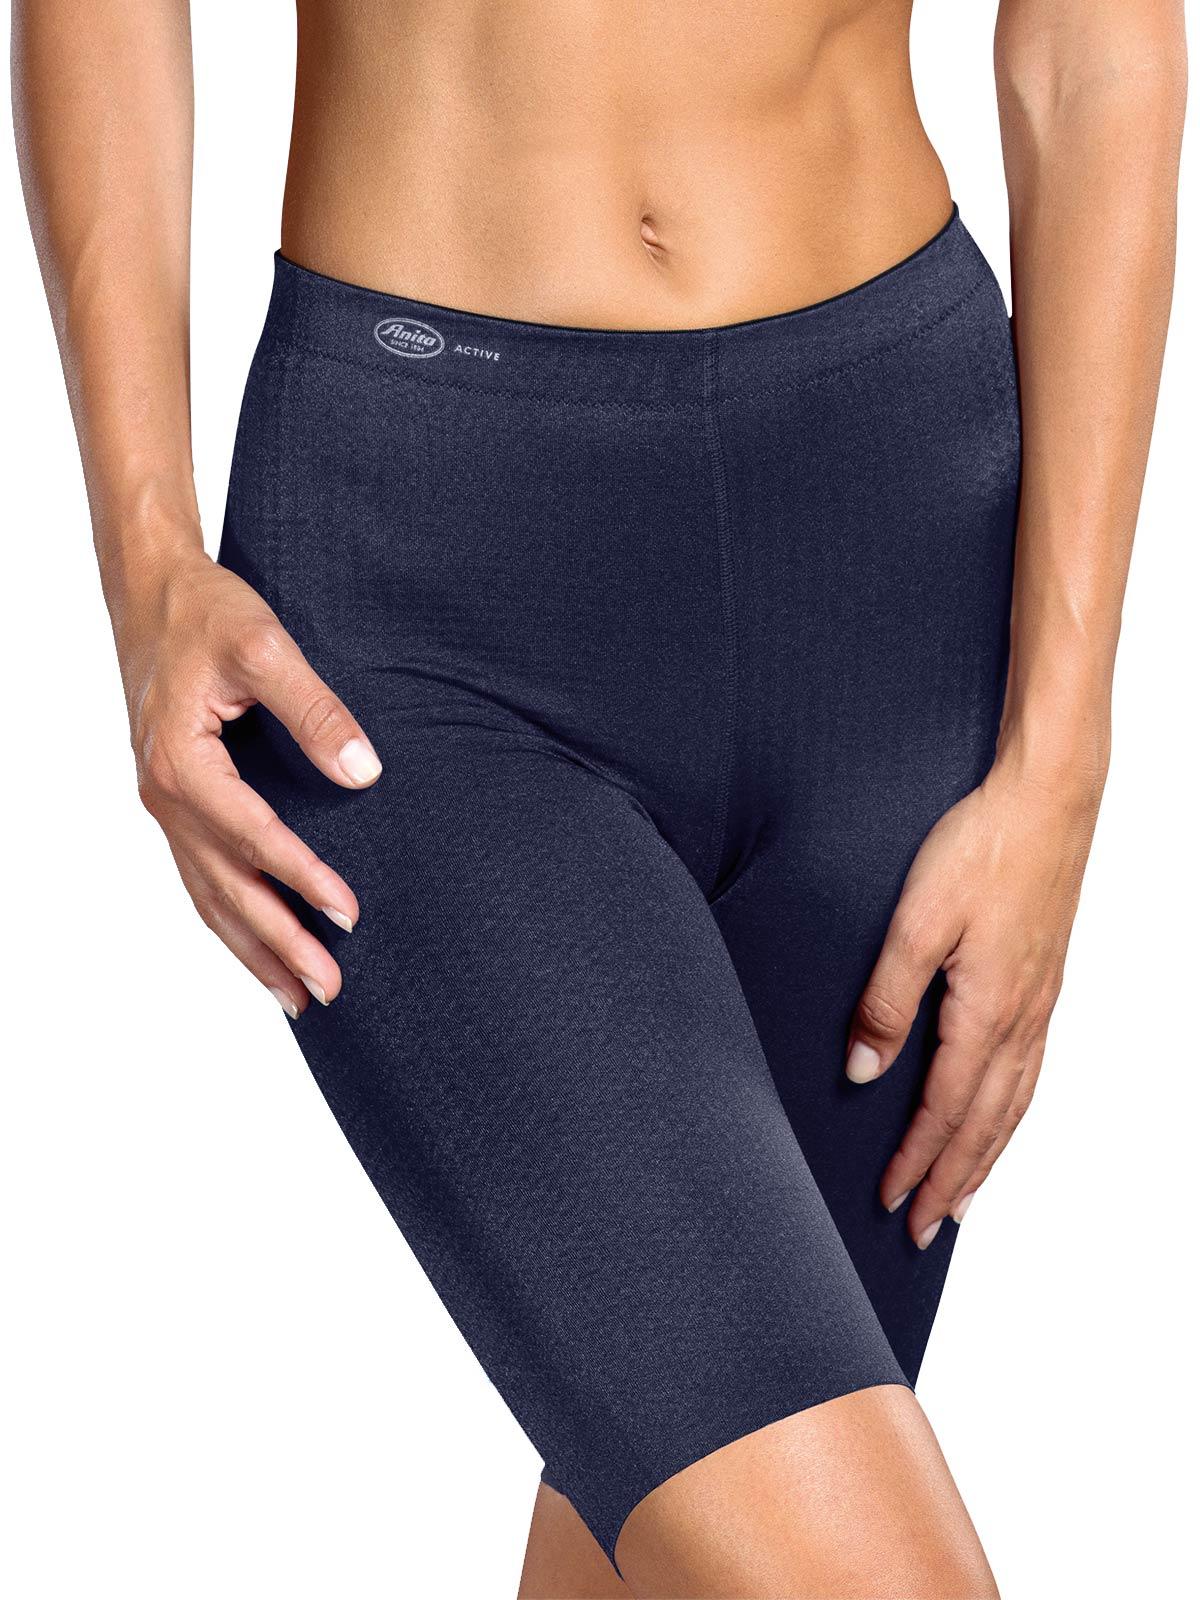 ANITA sport tights massage Gr. 46 in blue iris